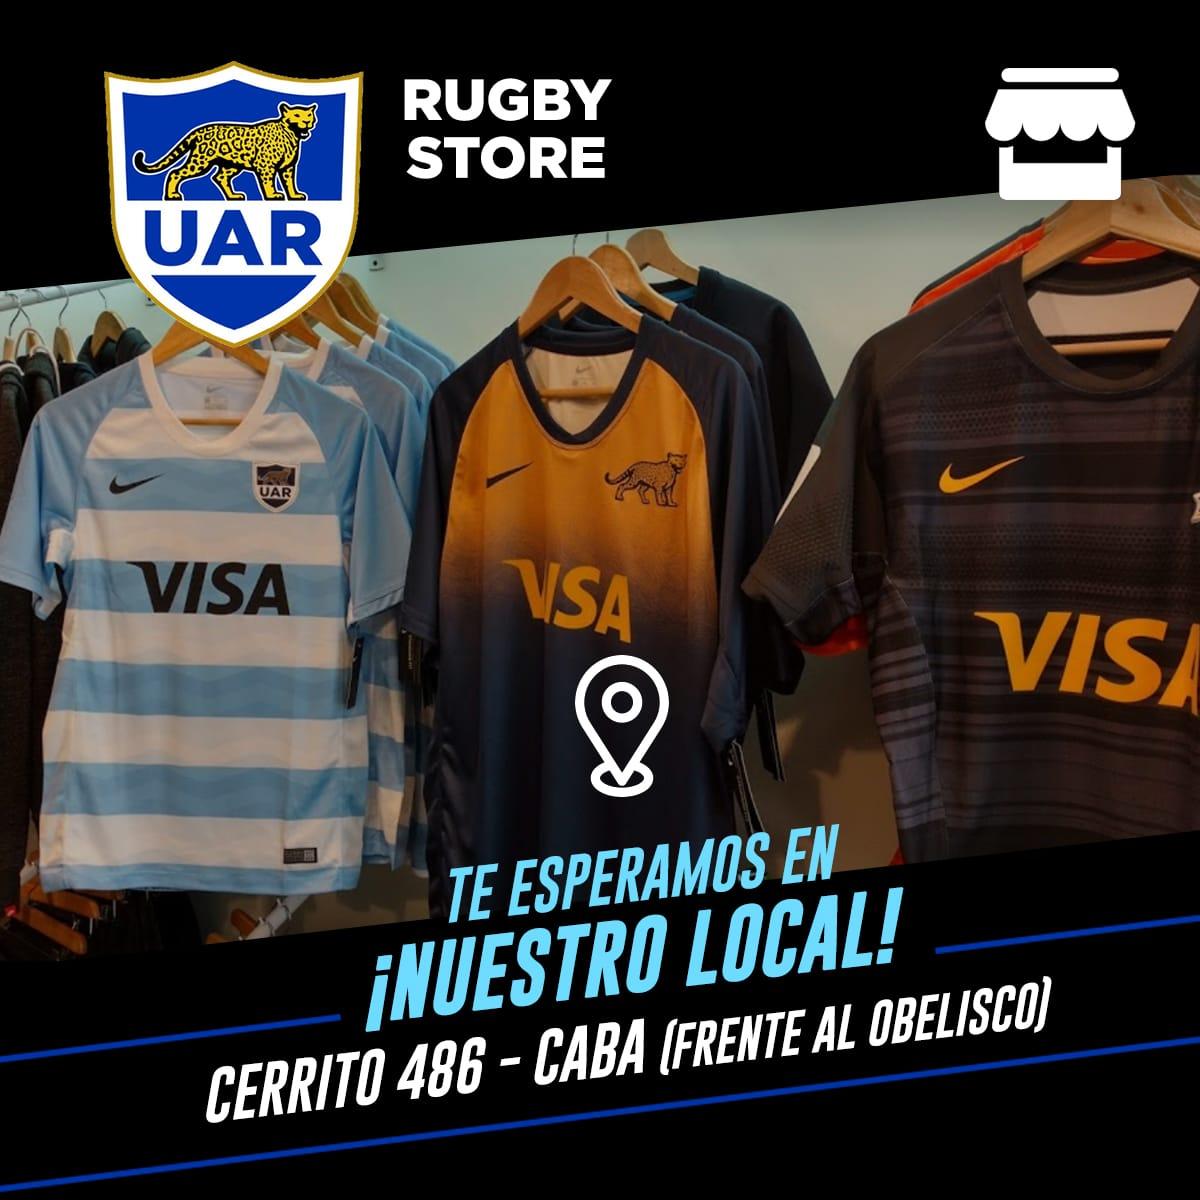 UnionArgentinaRugby @unionargentina